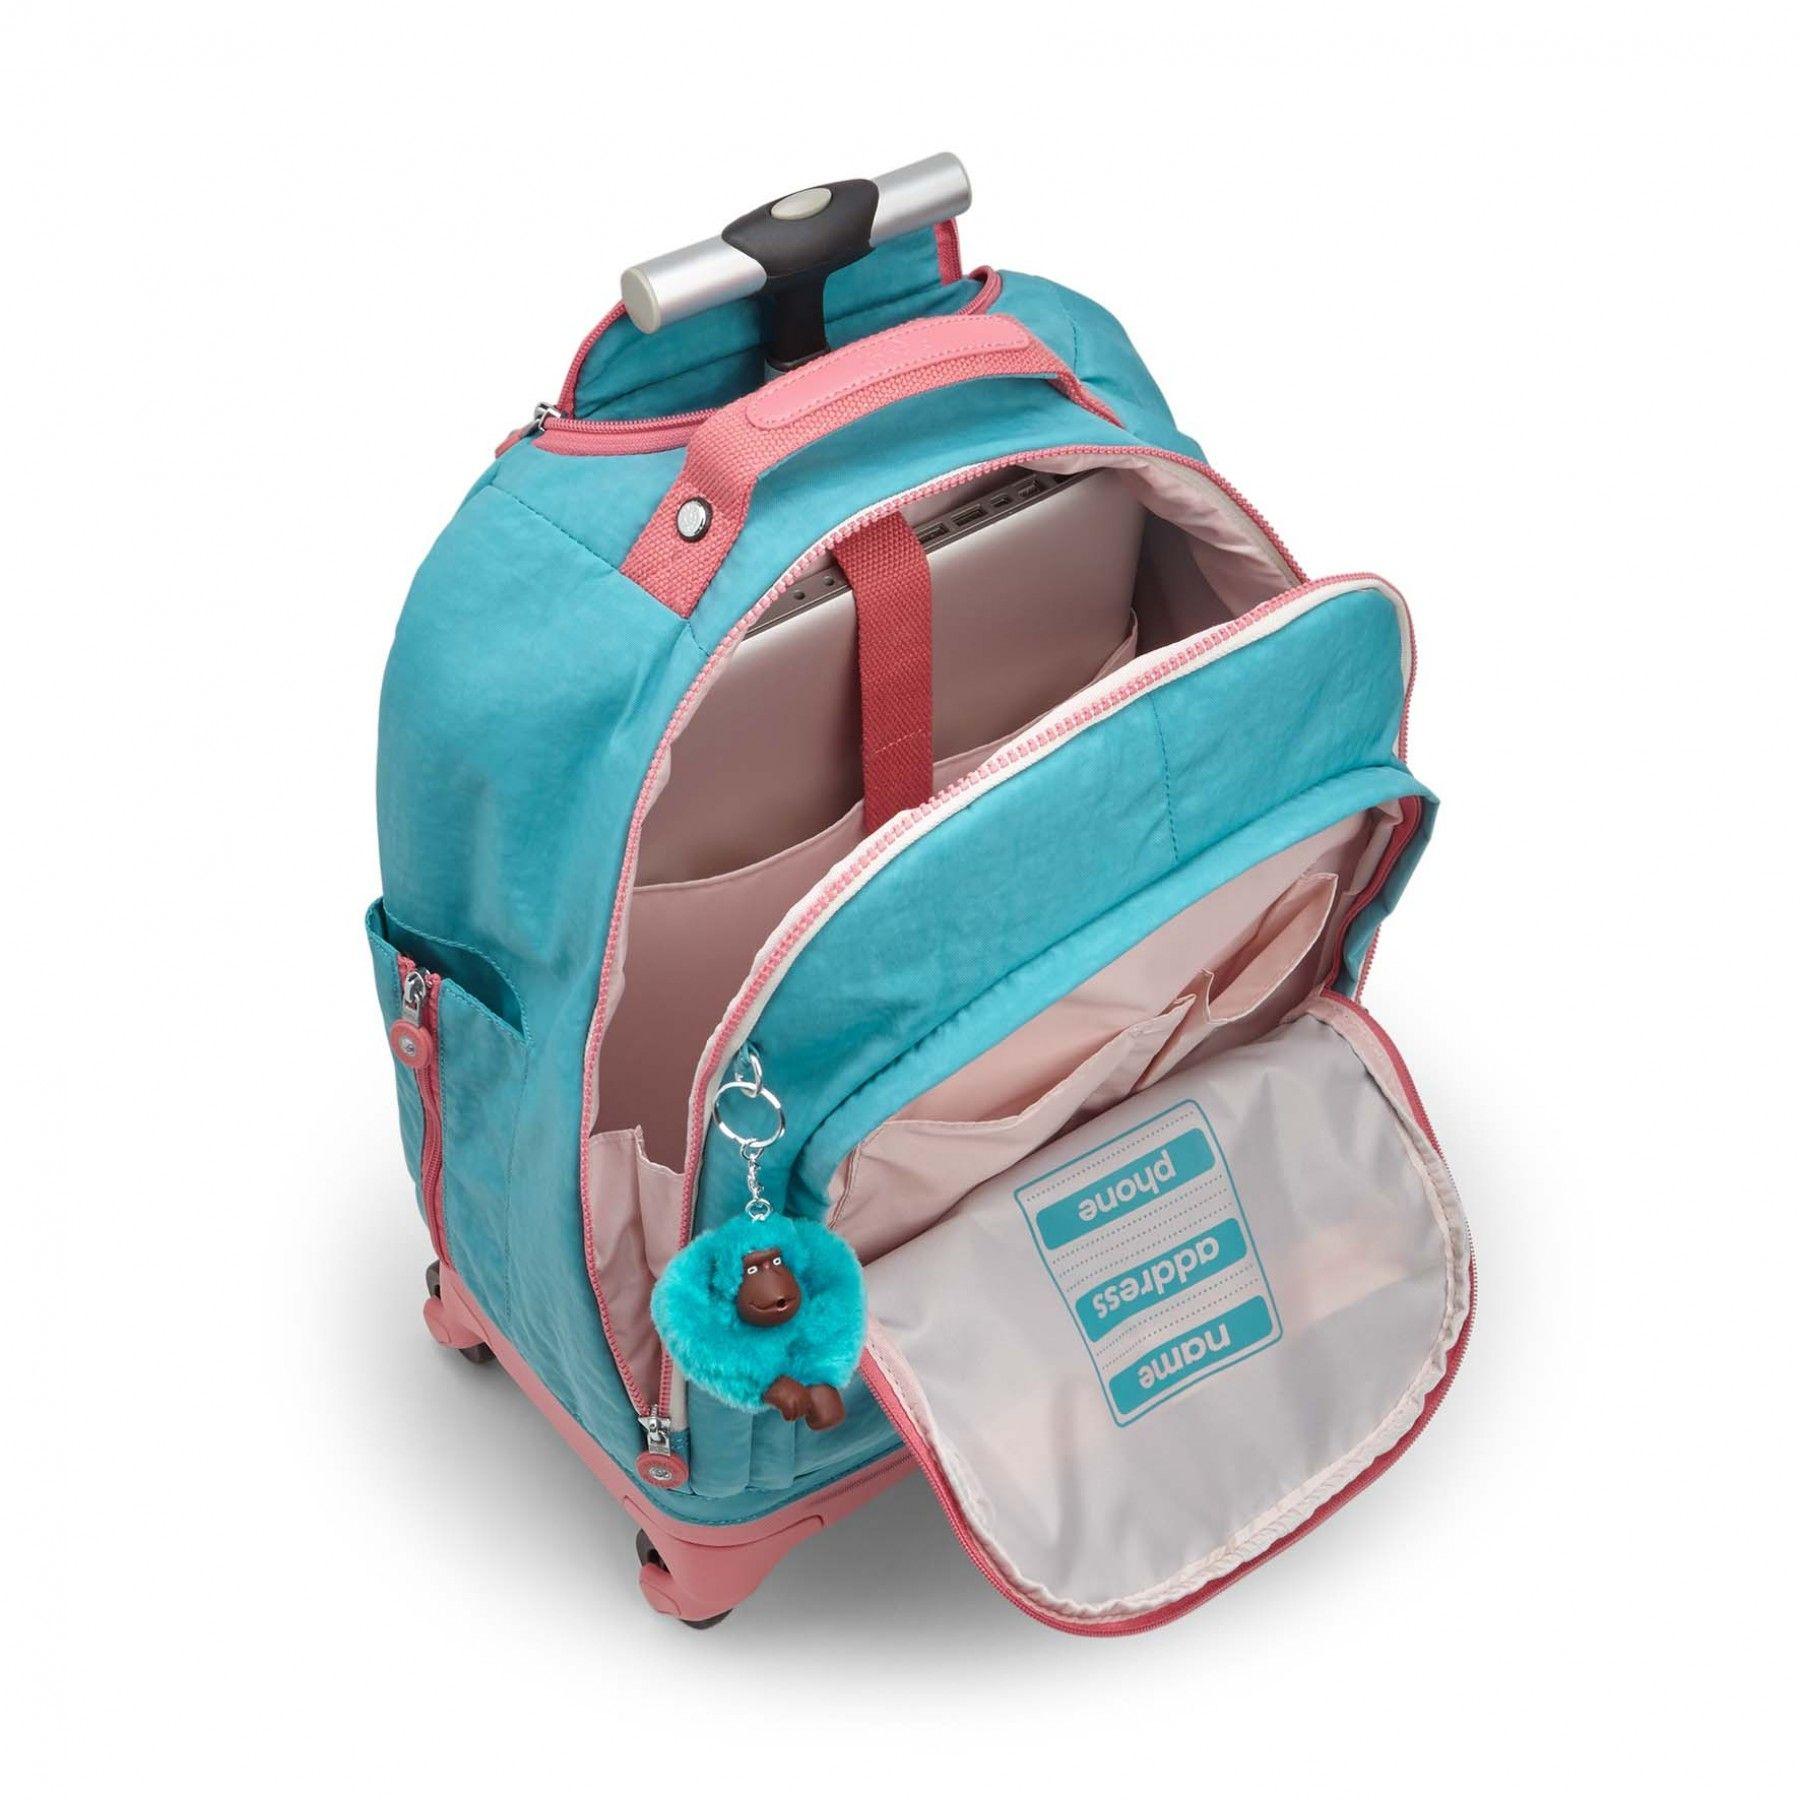 By Backpacks Bright InsideSchool Wheeled Kipling Echo Aqua C deCxBro